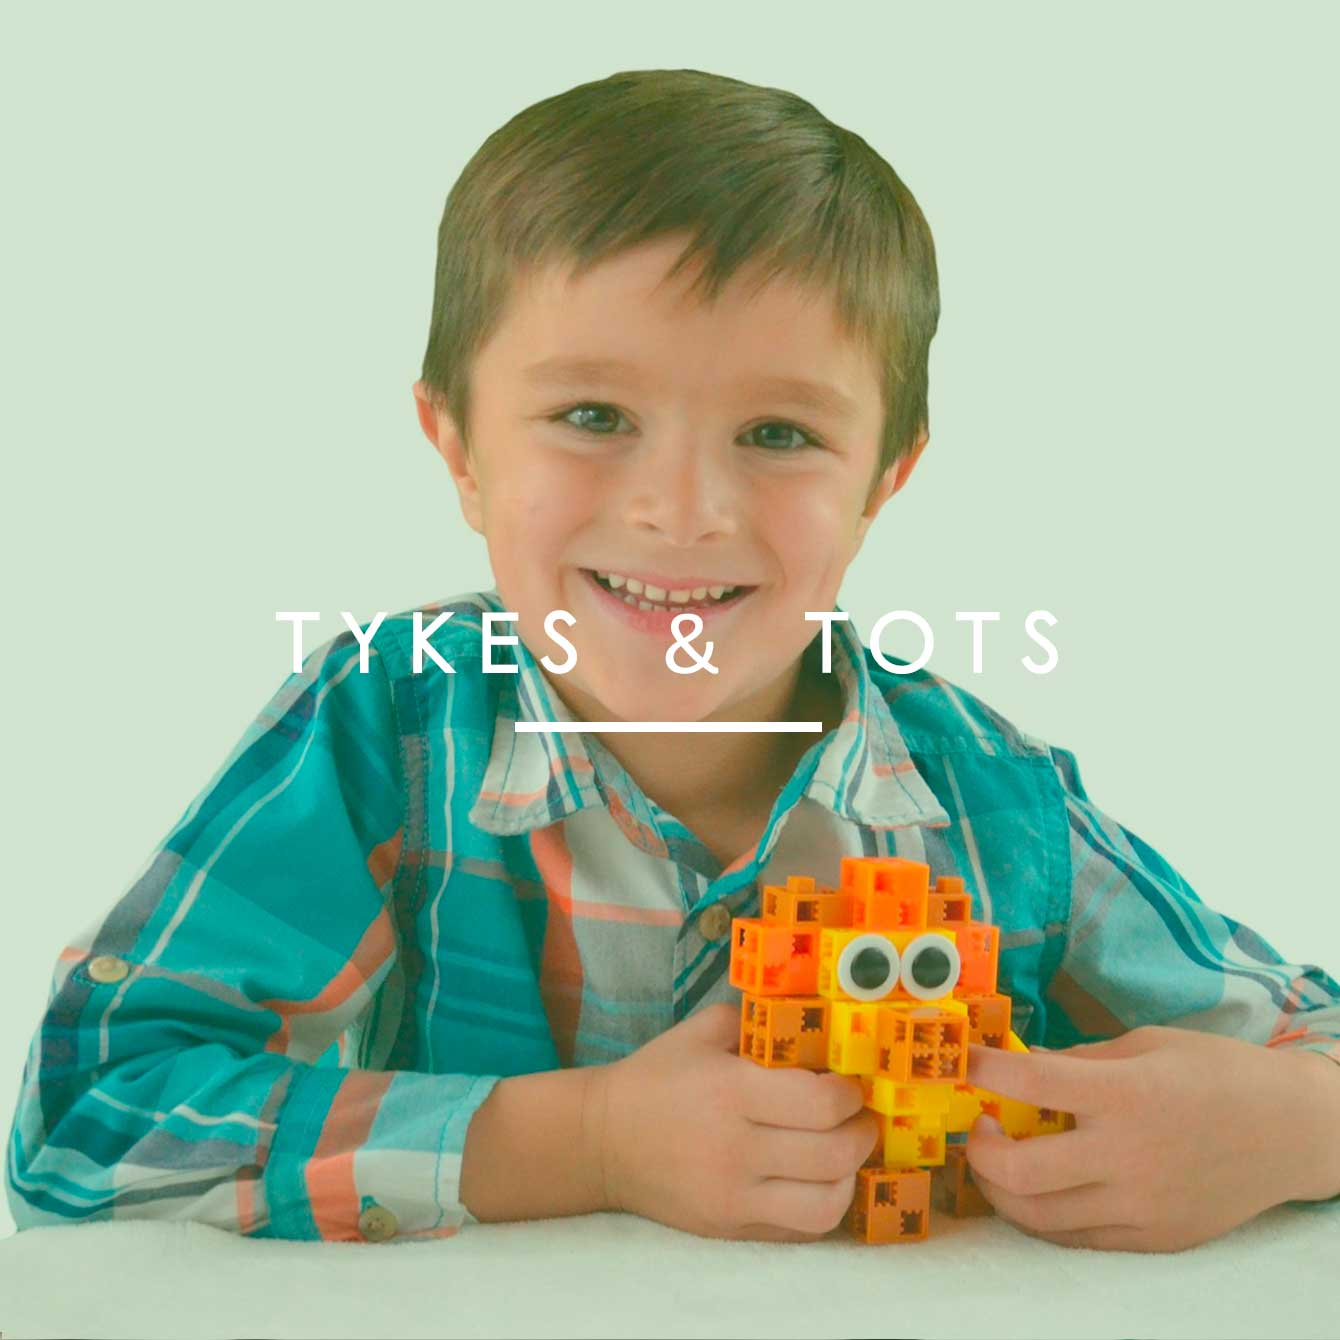 Amazon Exclusives: Tykes & Tots